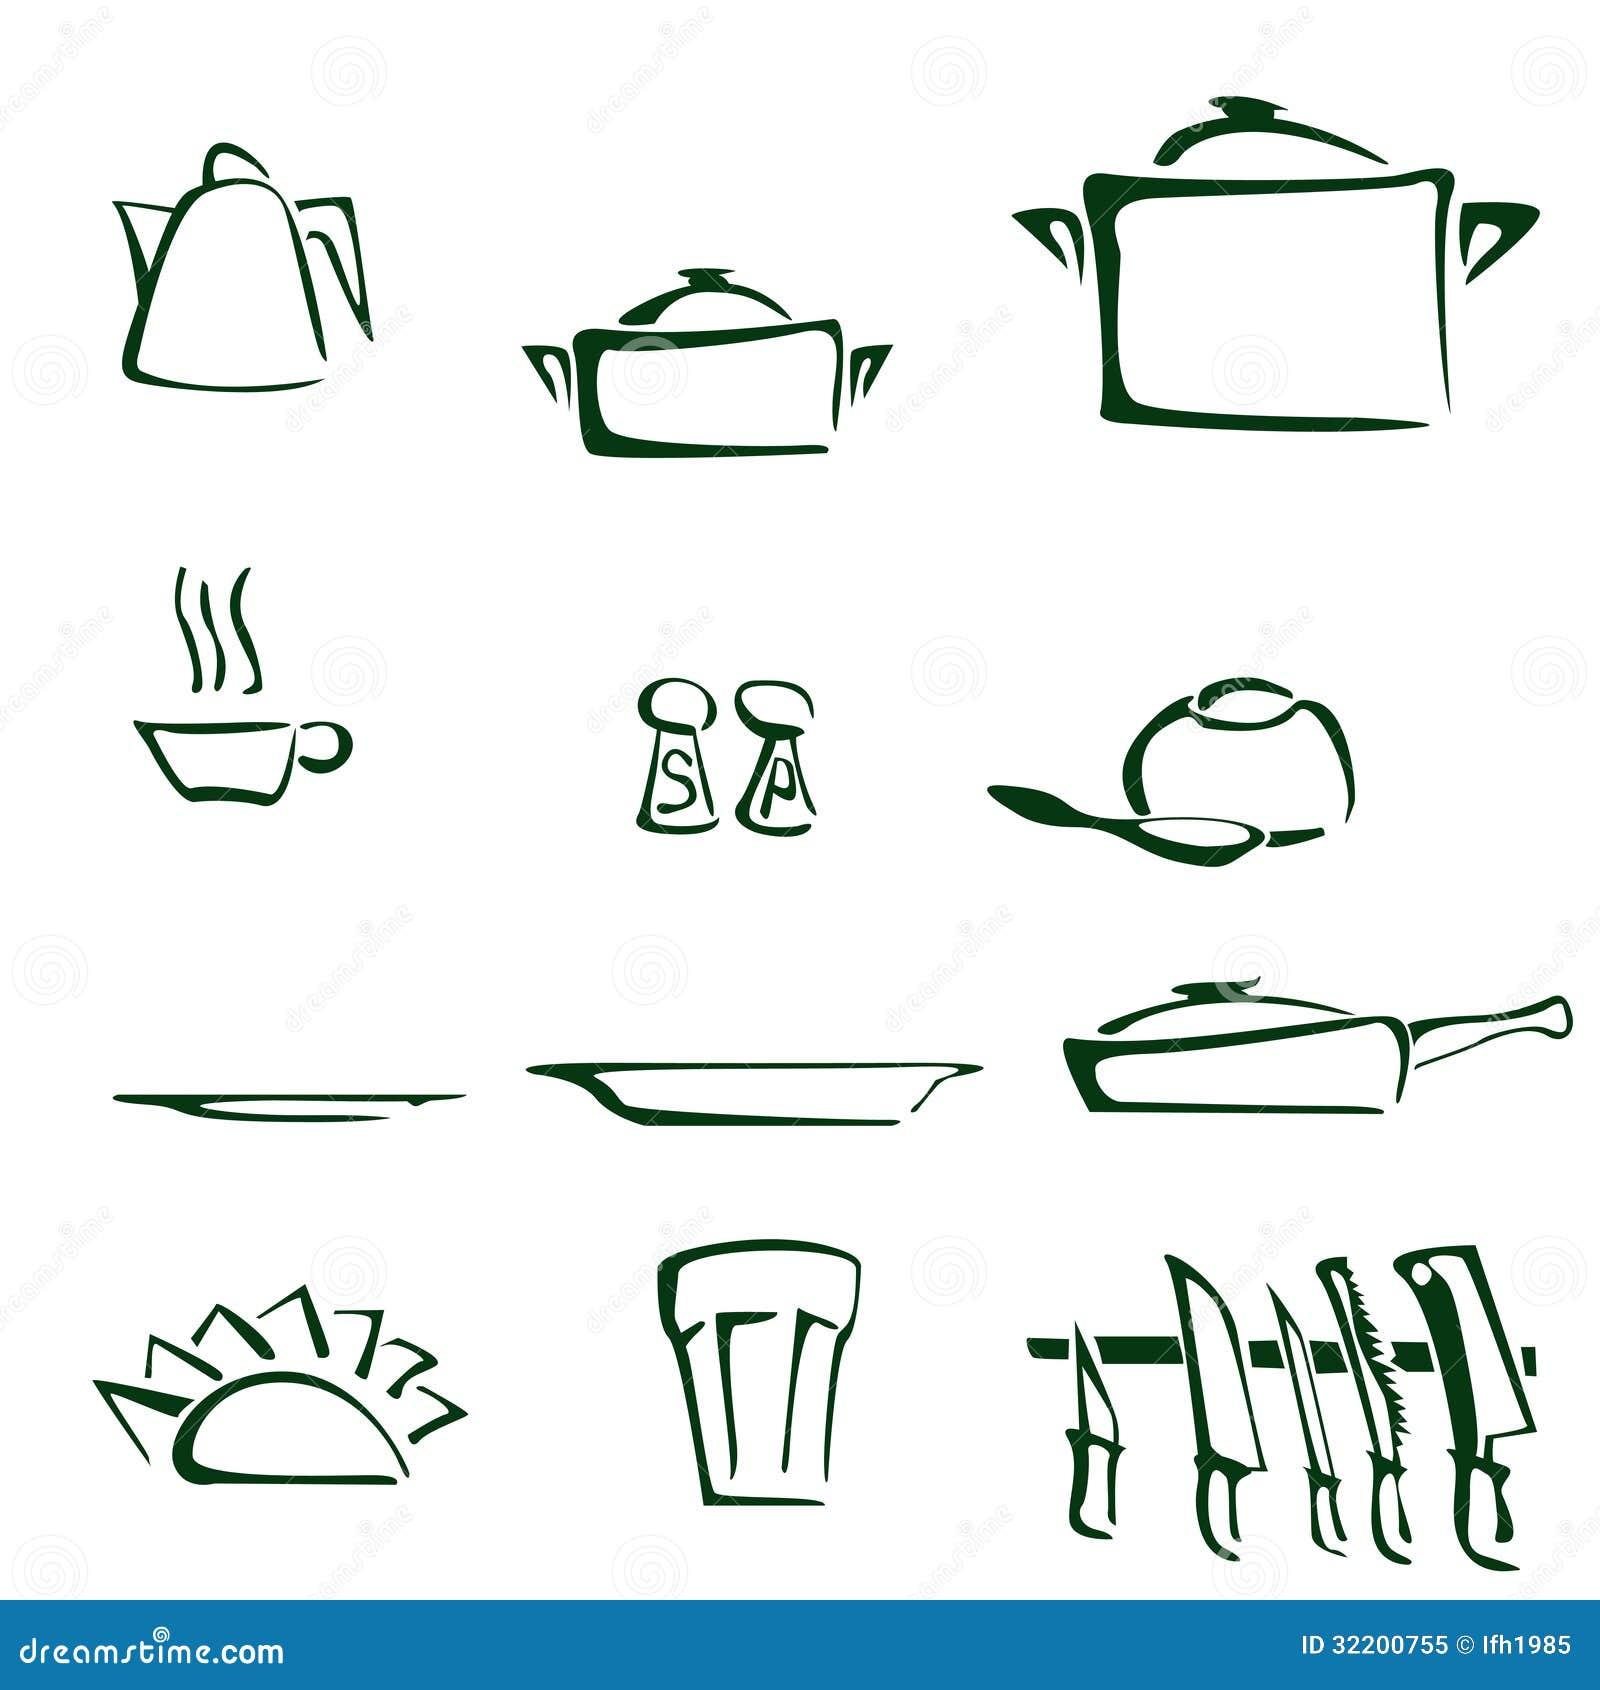 Set Of Kitchen Tools Royalty Free Stock Photo - Image: 32200755